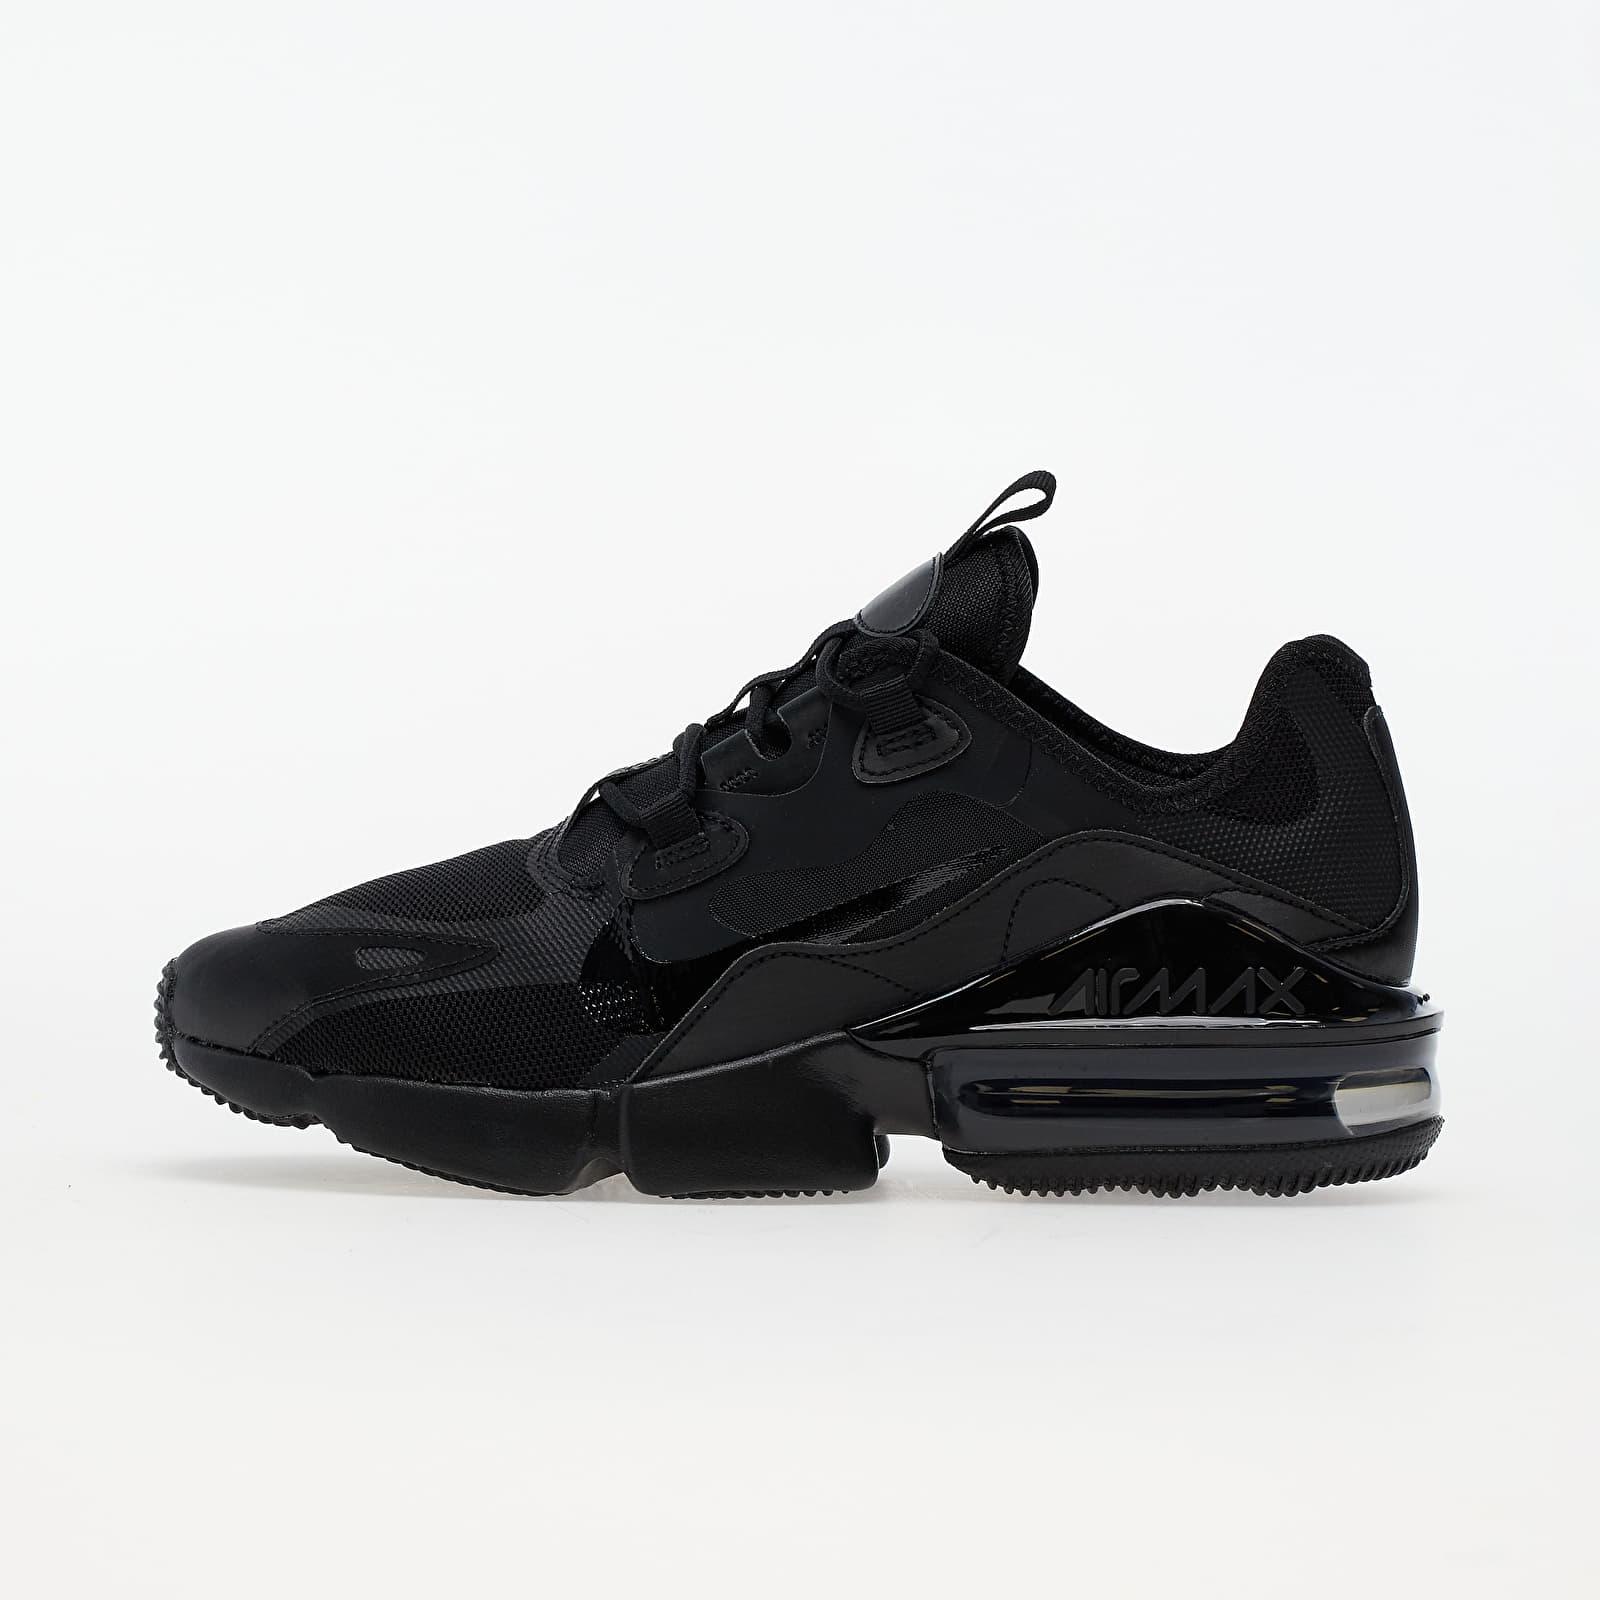 Nike Air Max Infinity 2 Black/ Black-Black-Anthracite EUR 42